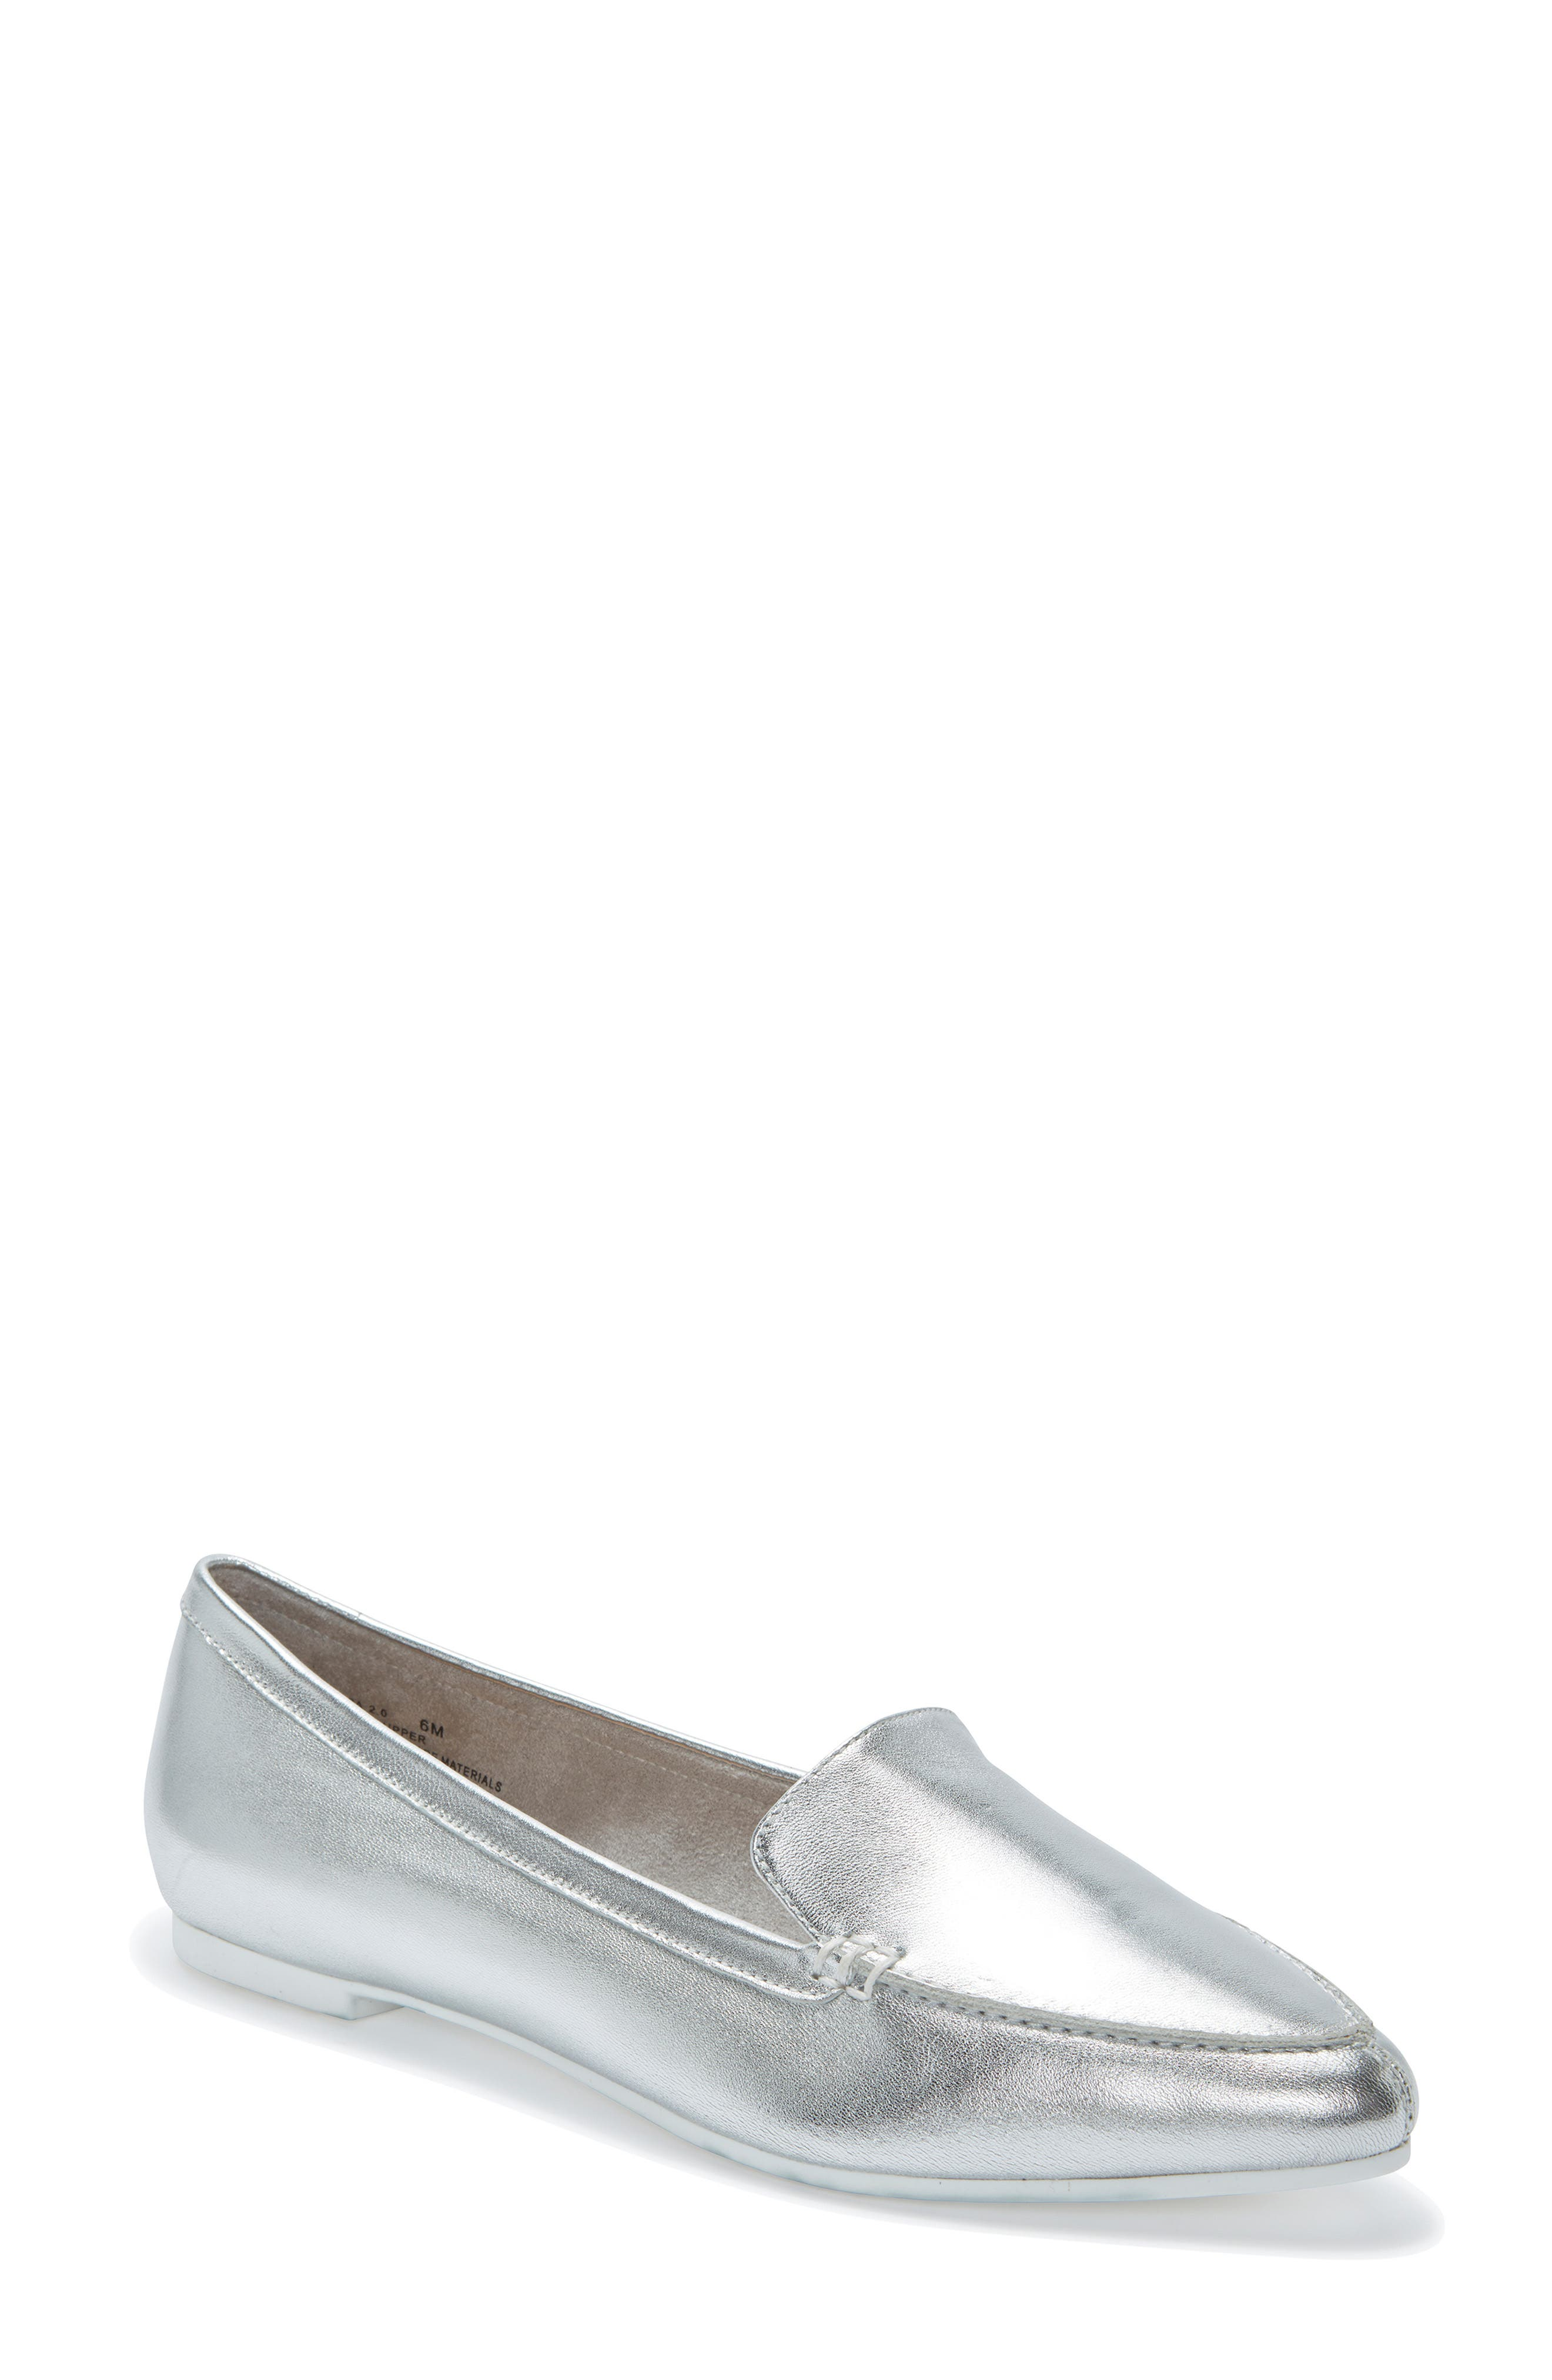 Me Too Audra Loafer Flat- Metallic